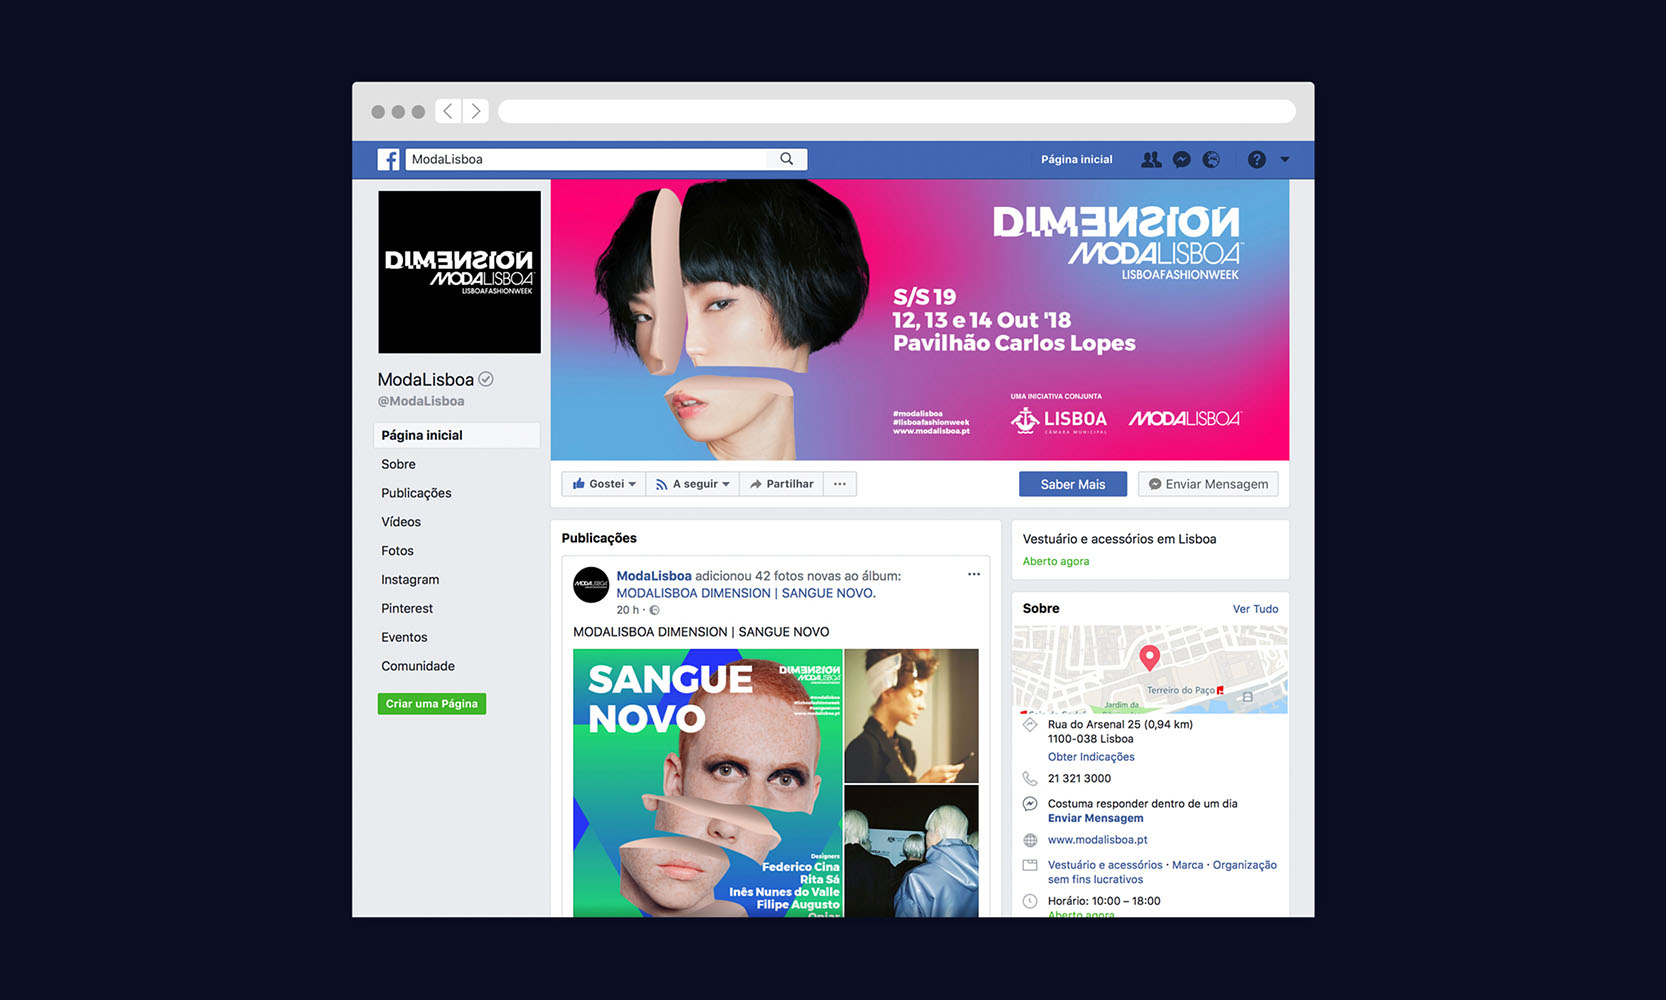 ModaLisboa facebook